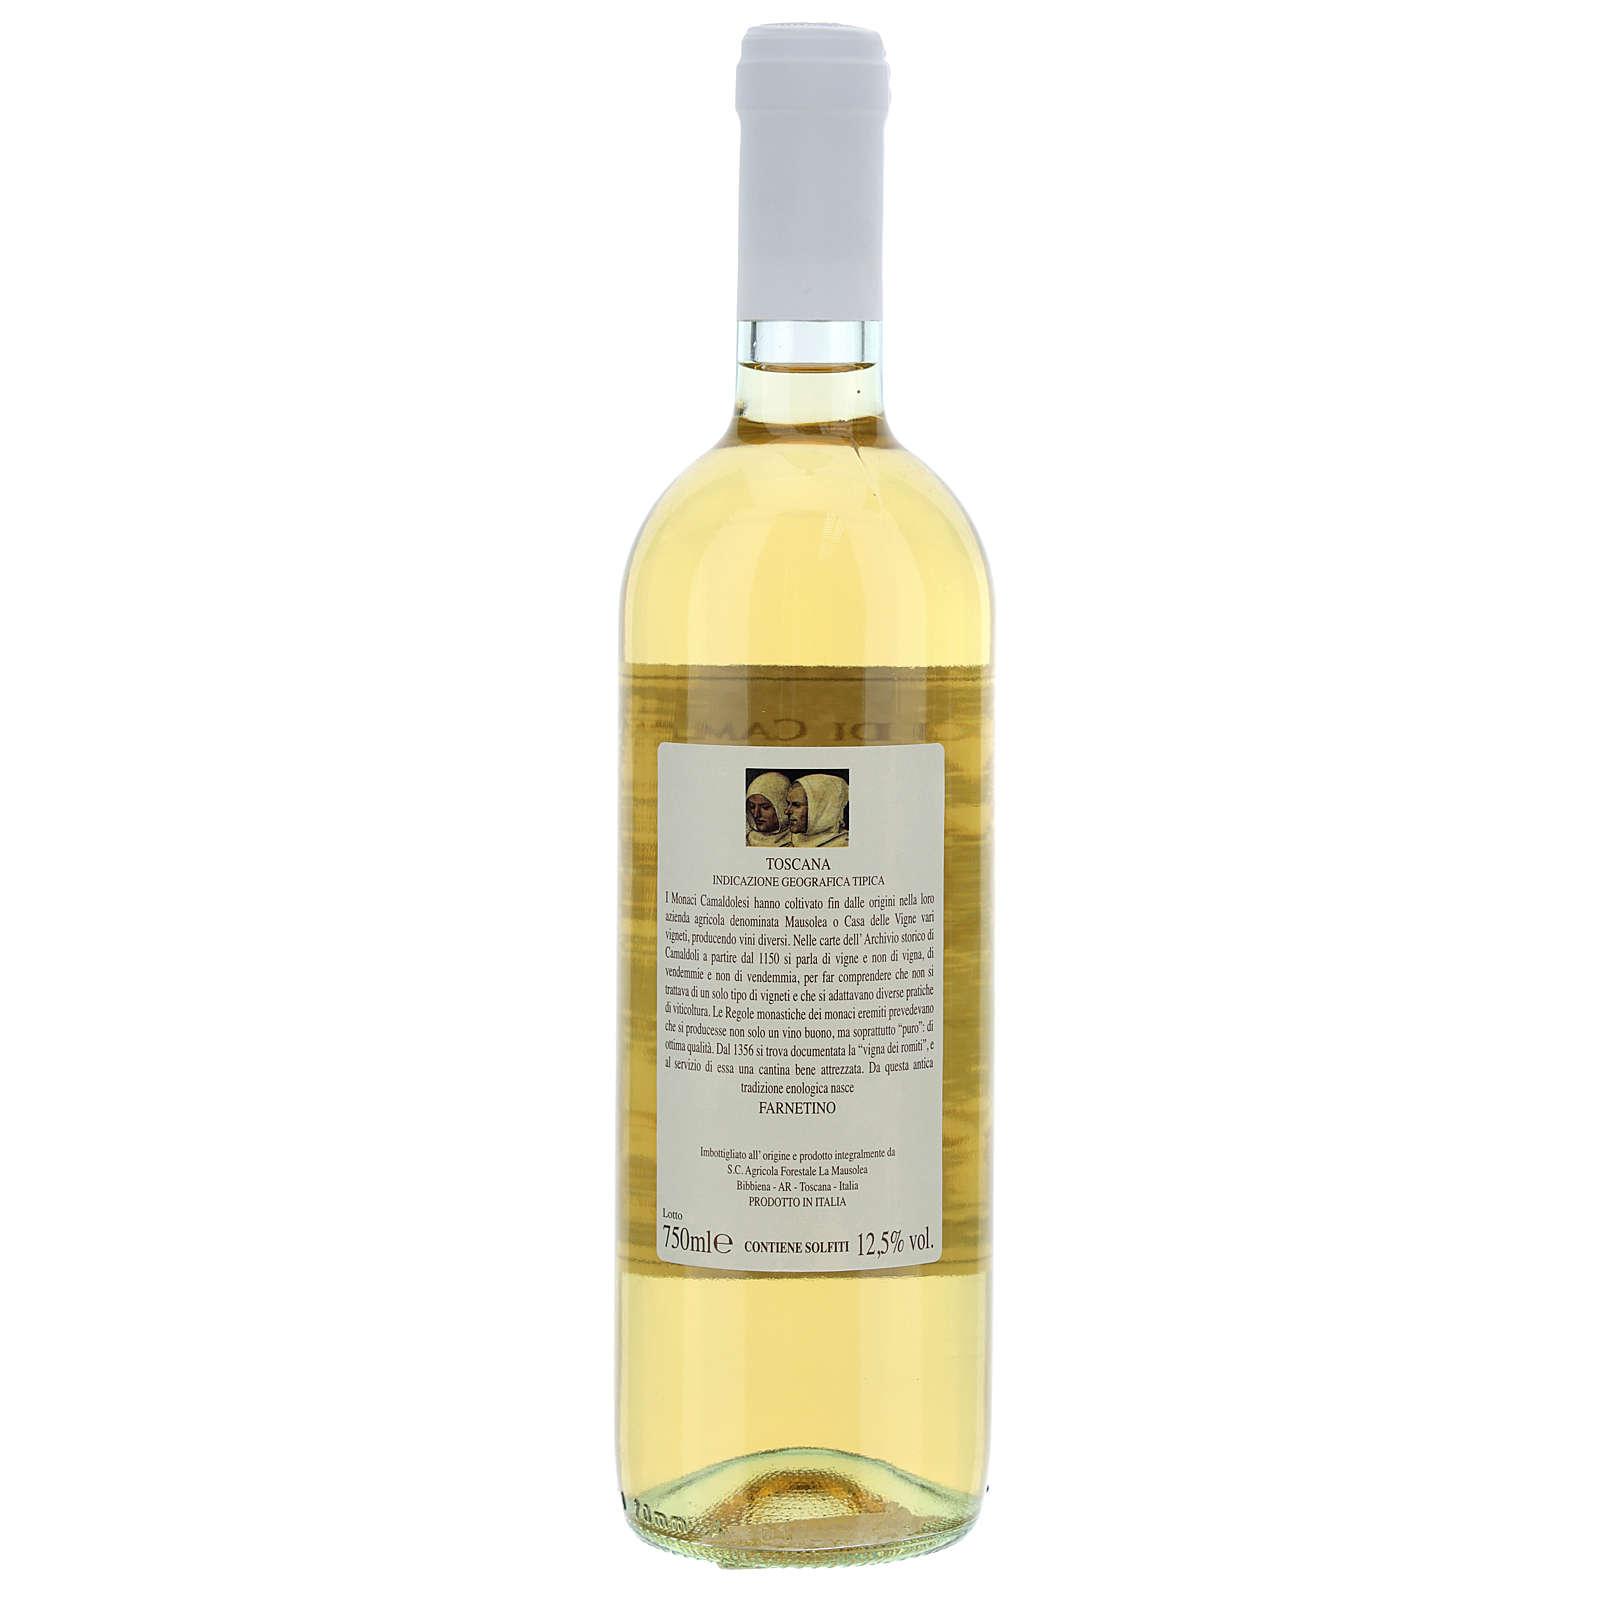 Vino blanco Toscano Borbotto 750 ml. 2015 3